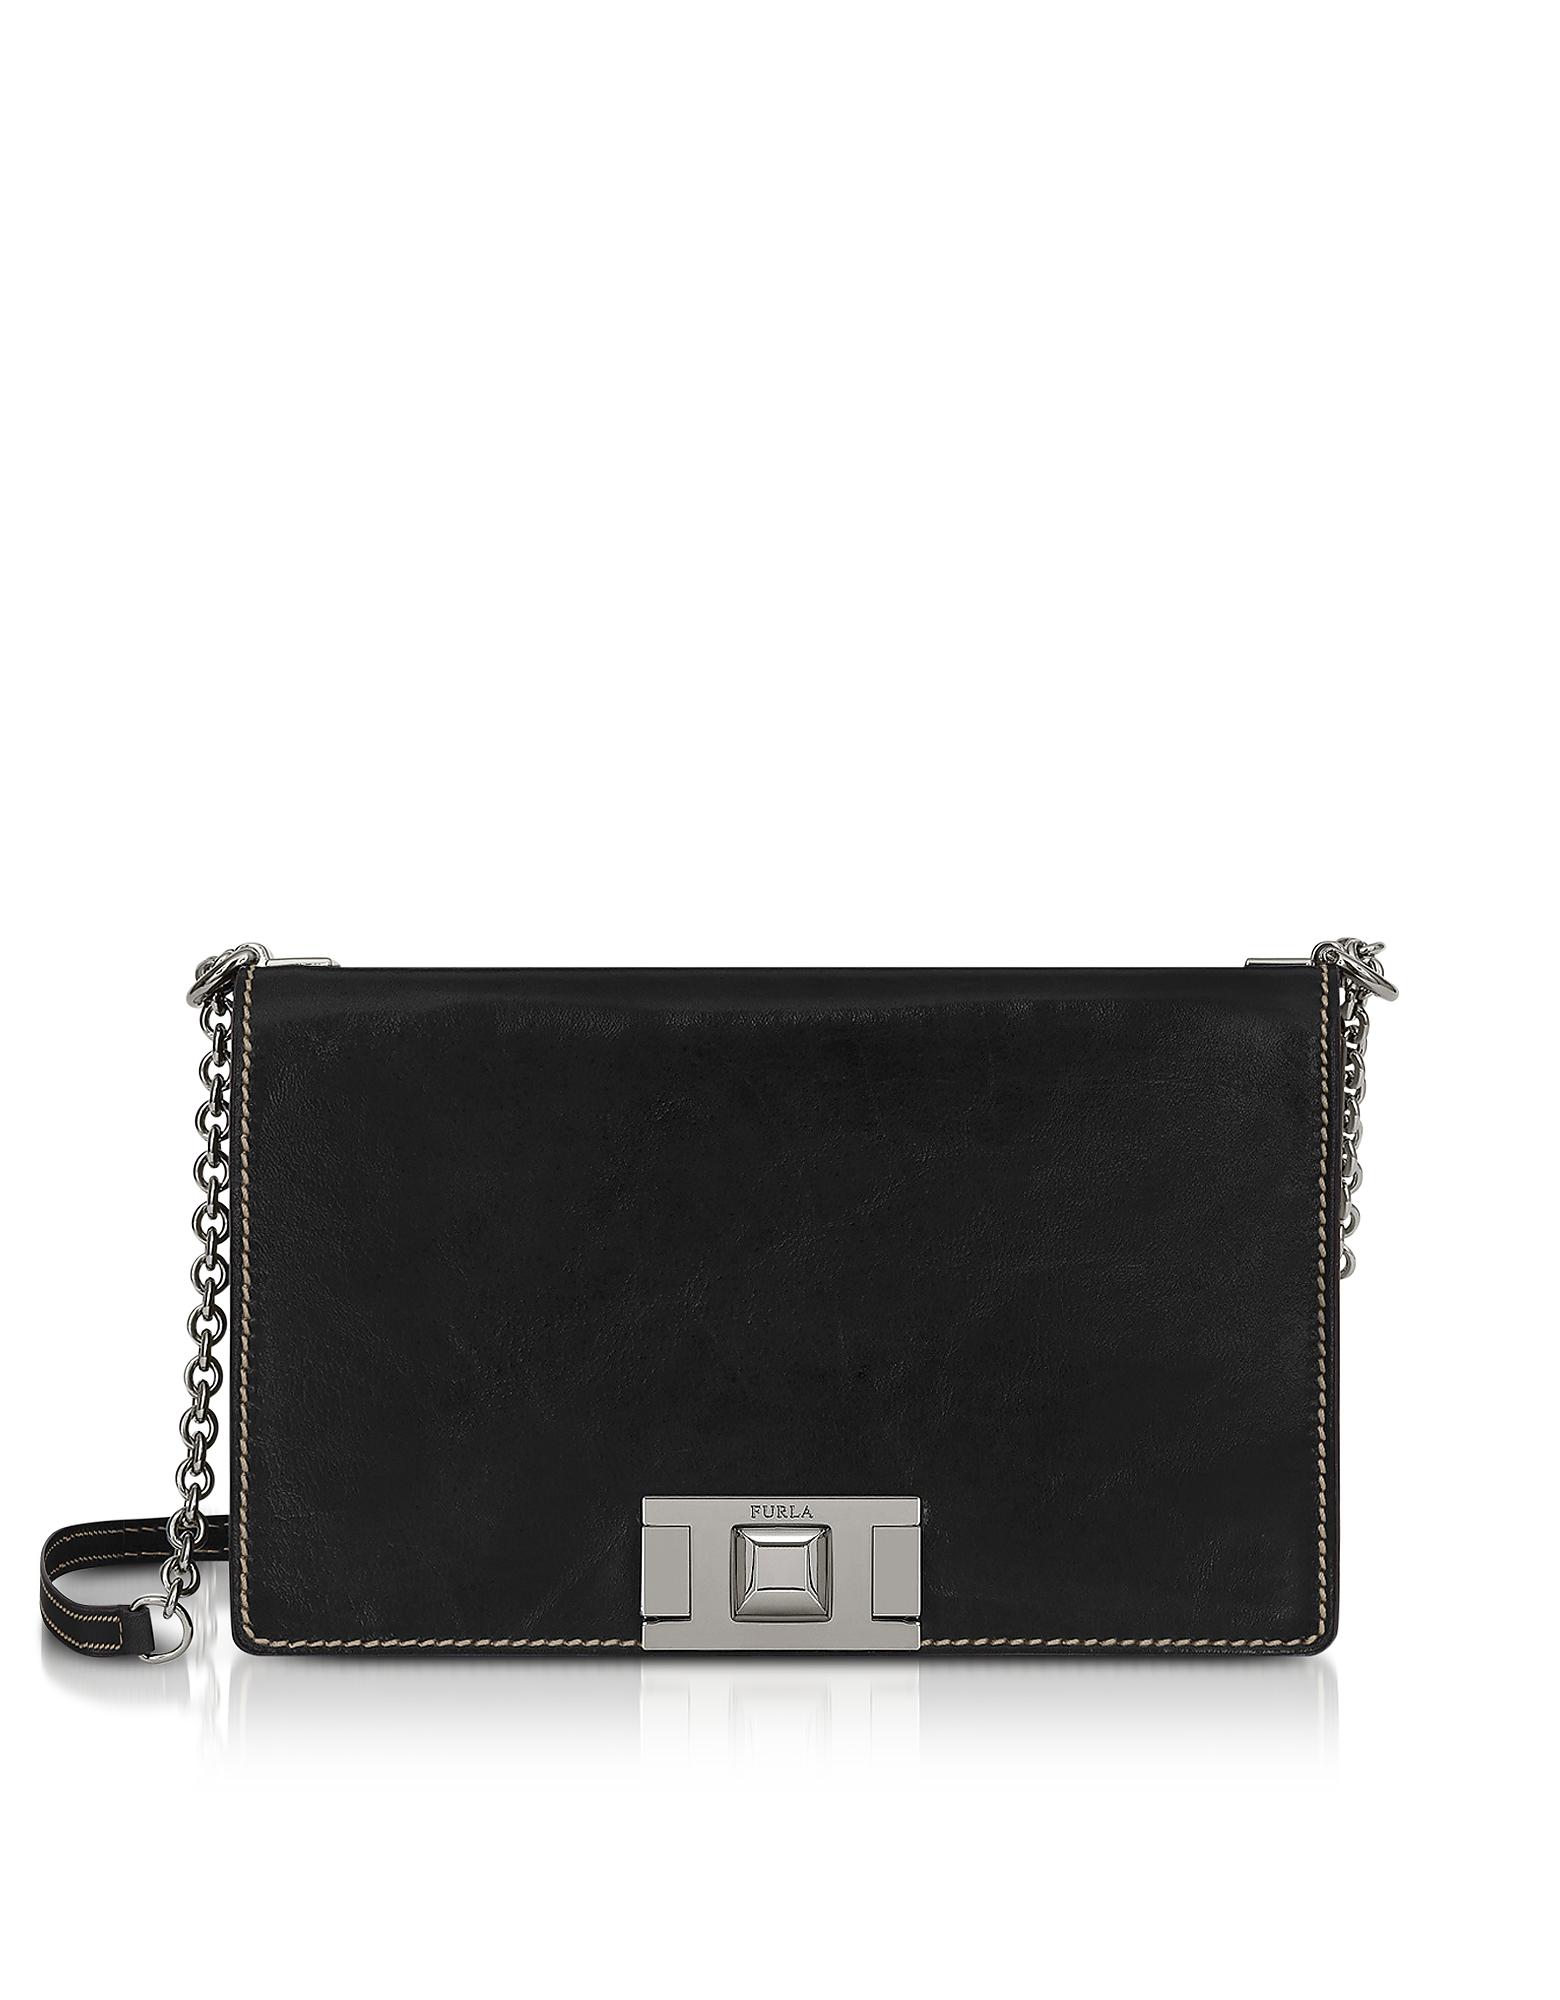 Furla Designer Handbags, Glossy Leather Mimì S Crossbody Bag